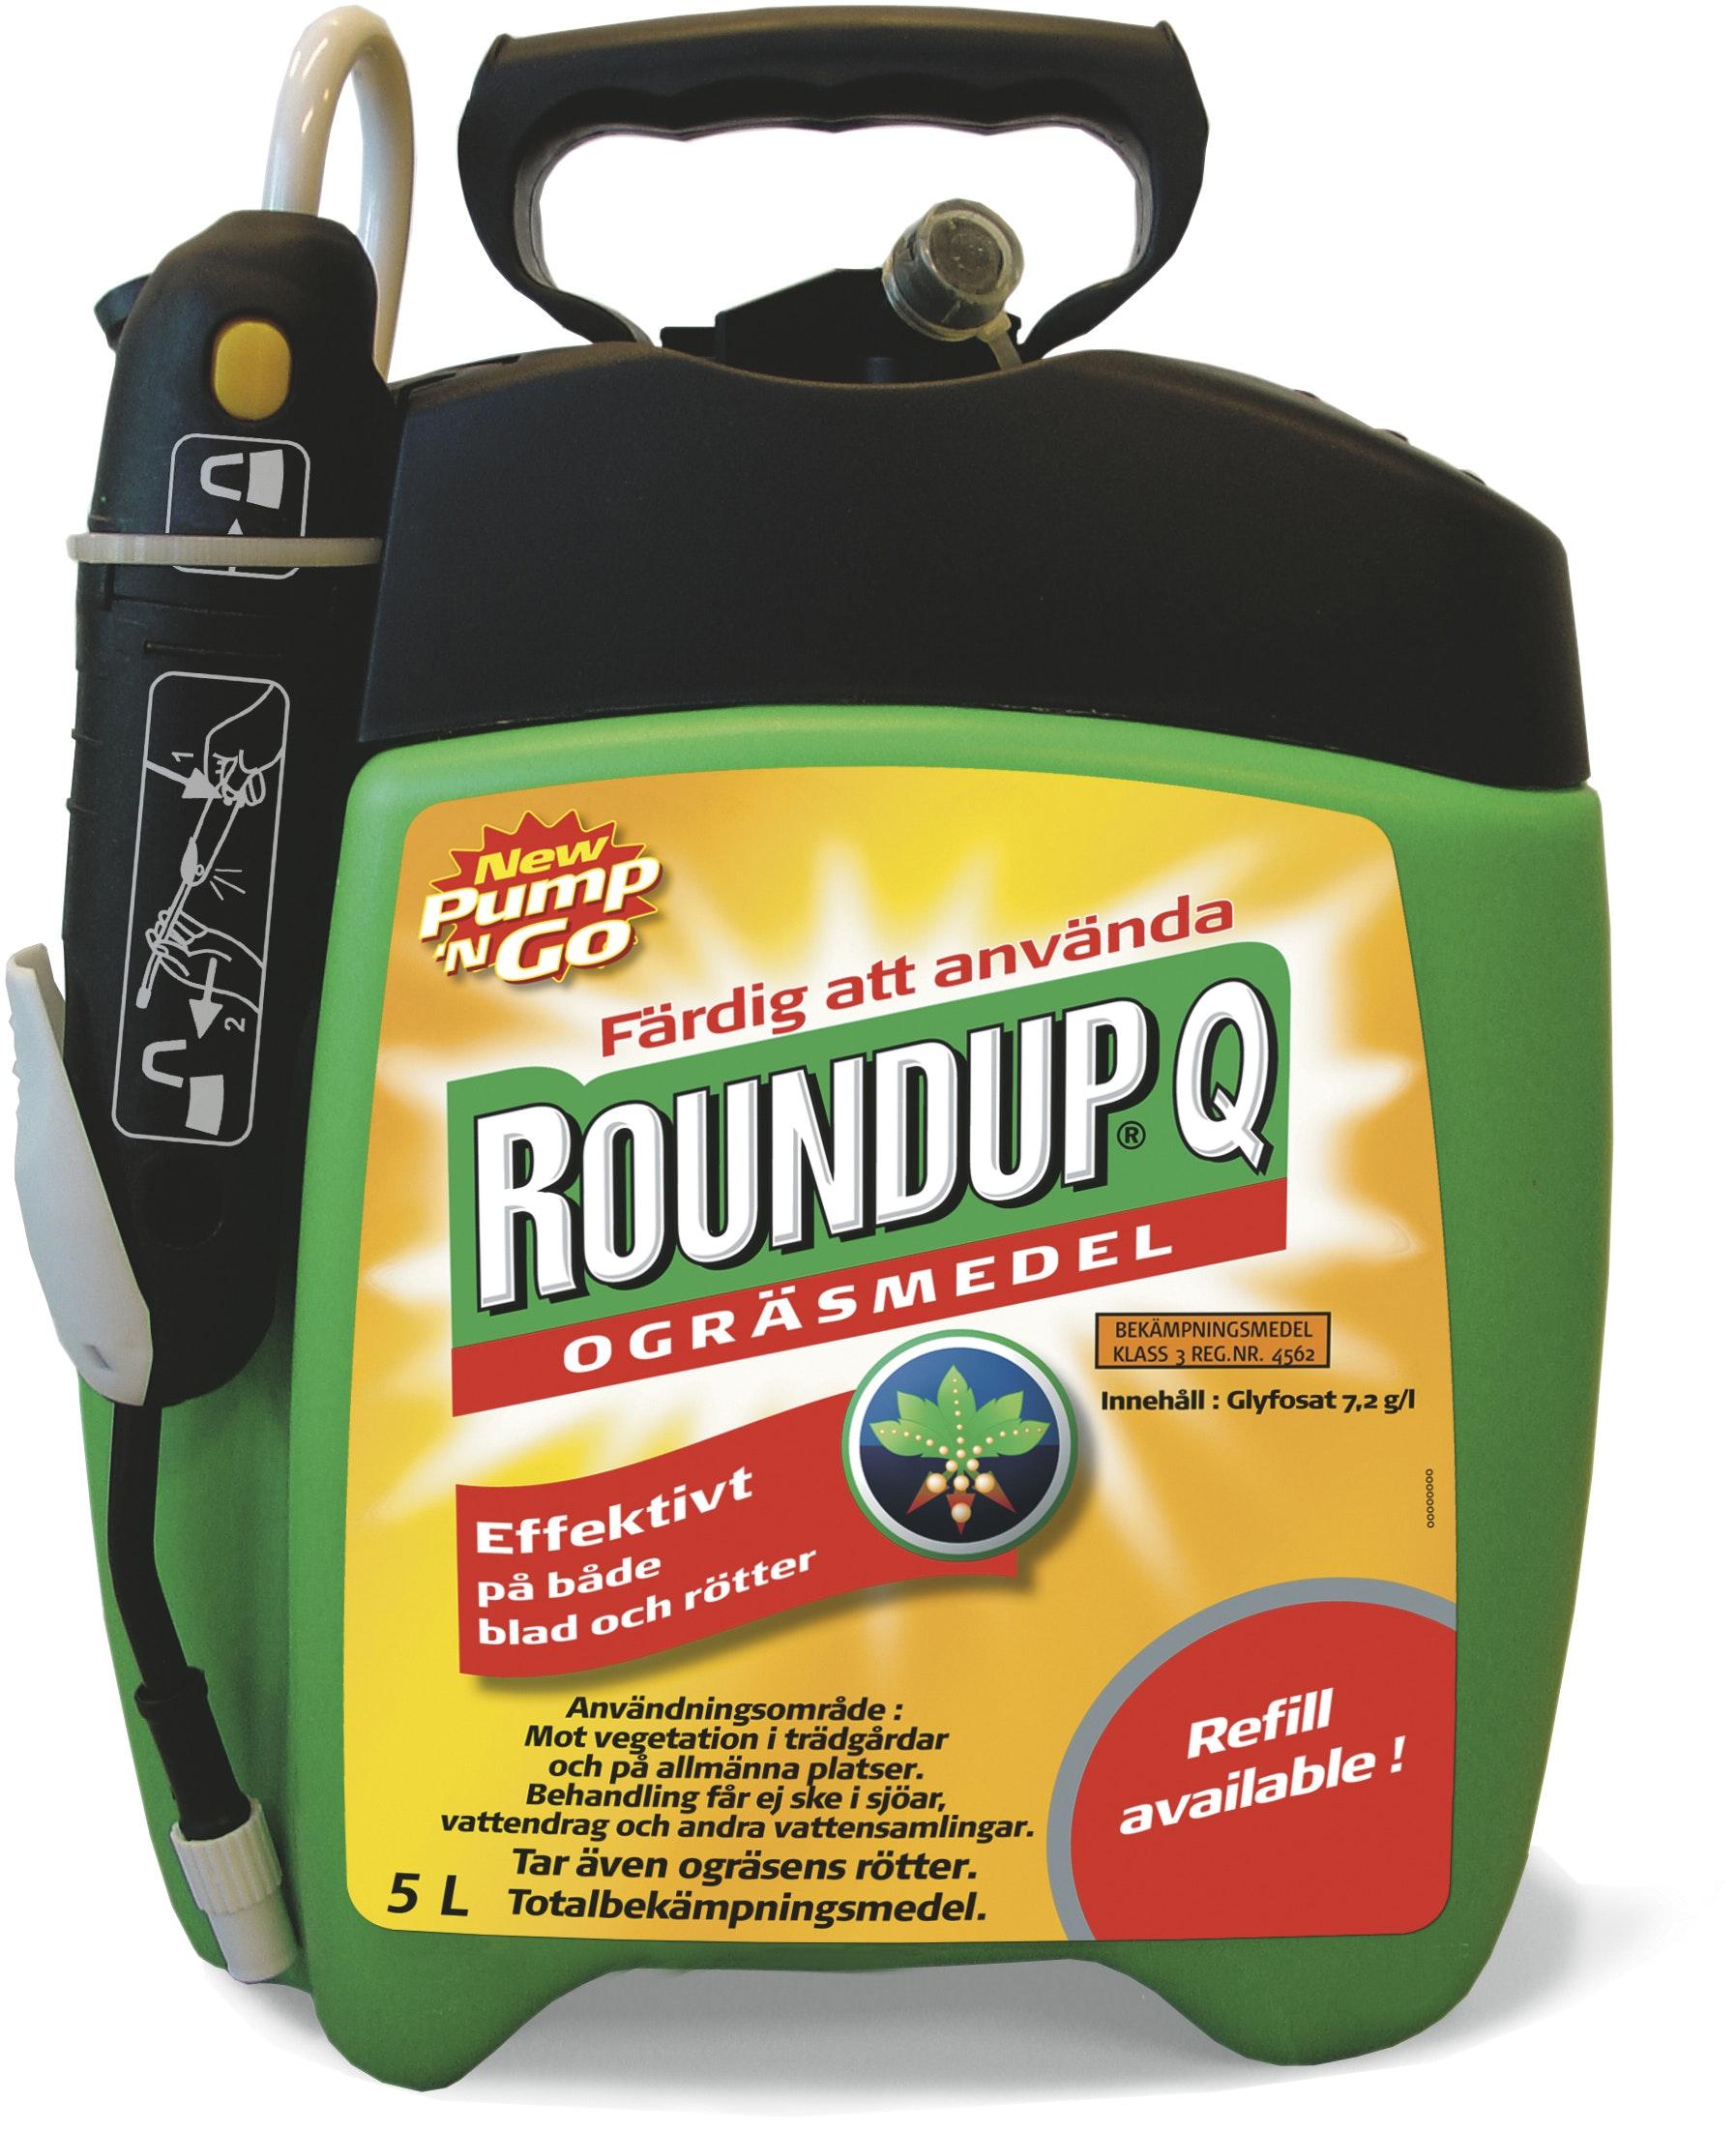 Roundup Q 5L Pump